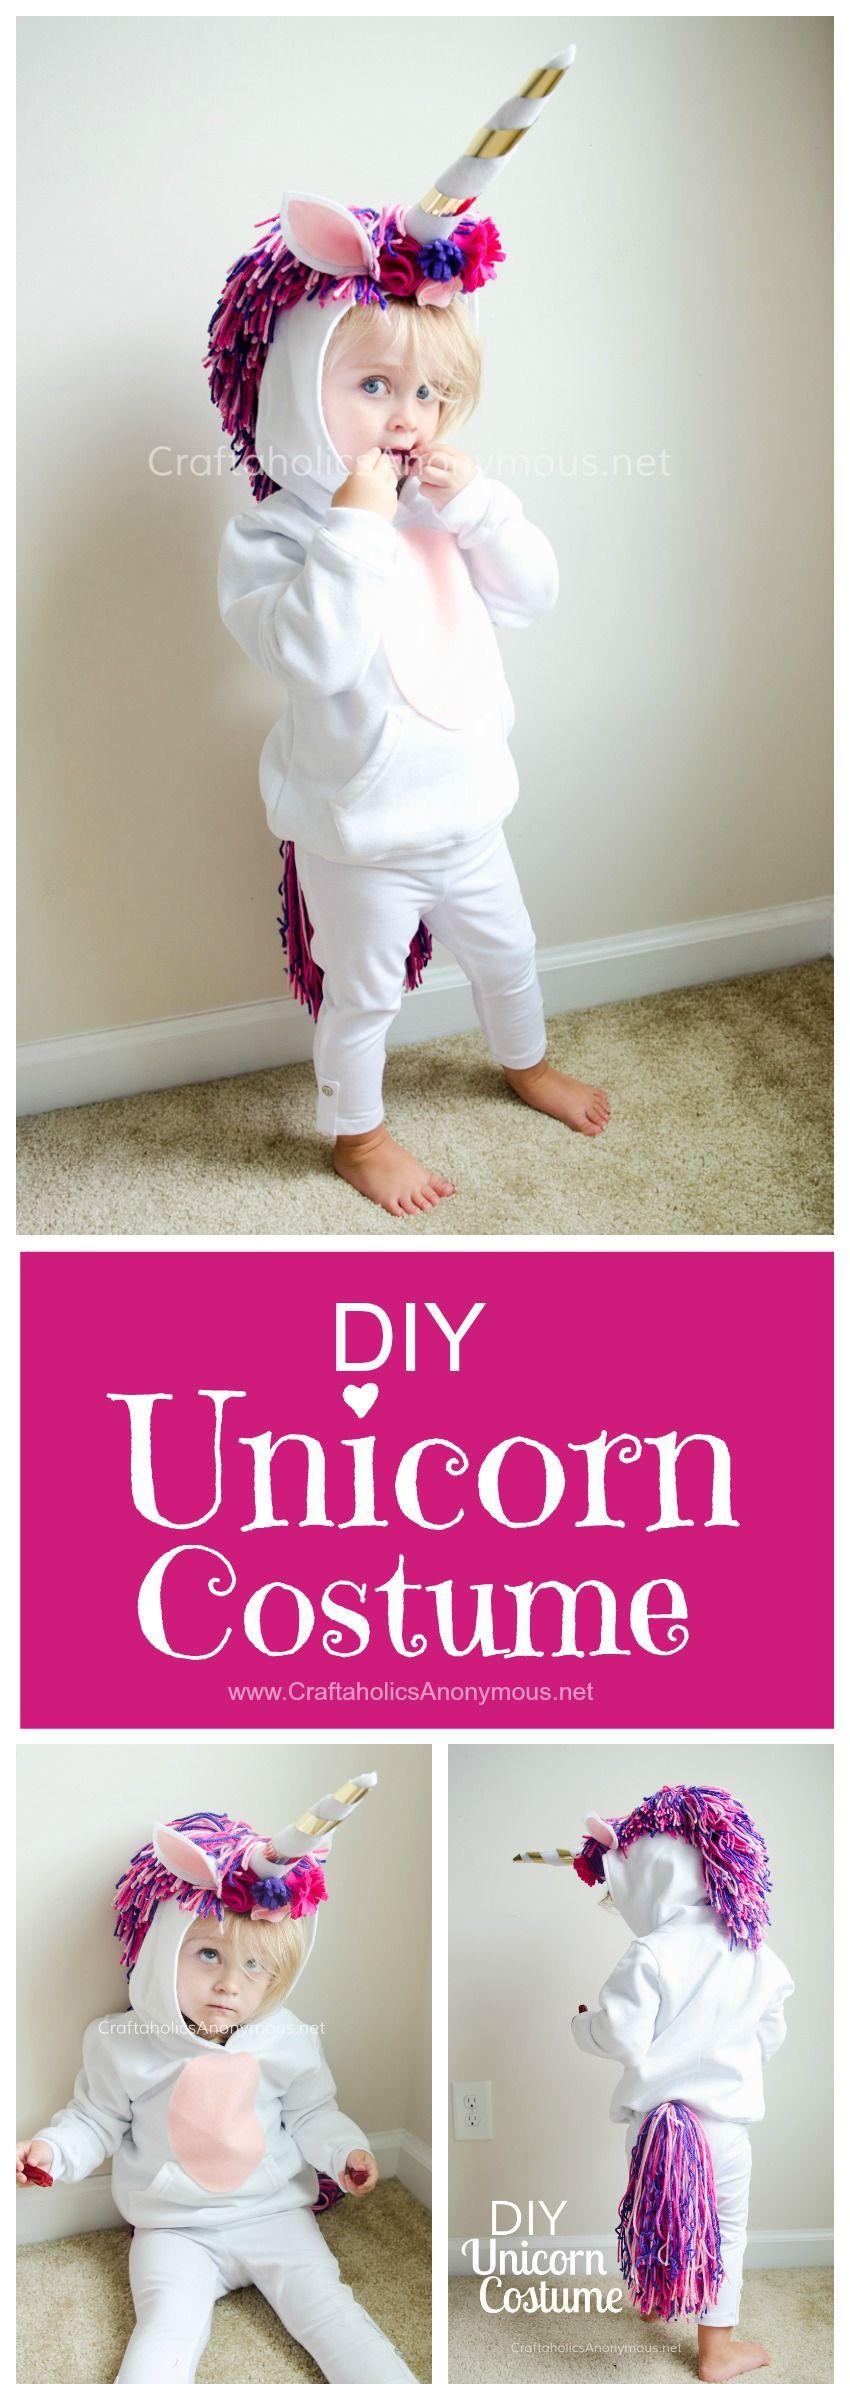 Diy unicorn costume tutorial all time favorite crafts diy unicorn costume diy tutorial such a cute handmade halloween costumes idea for kids solutioingenieria Choice Image